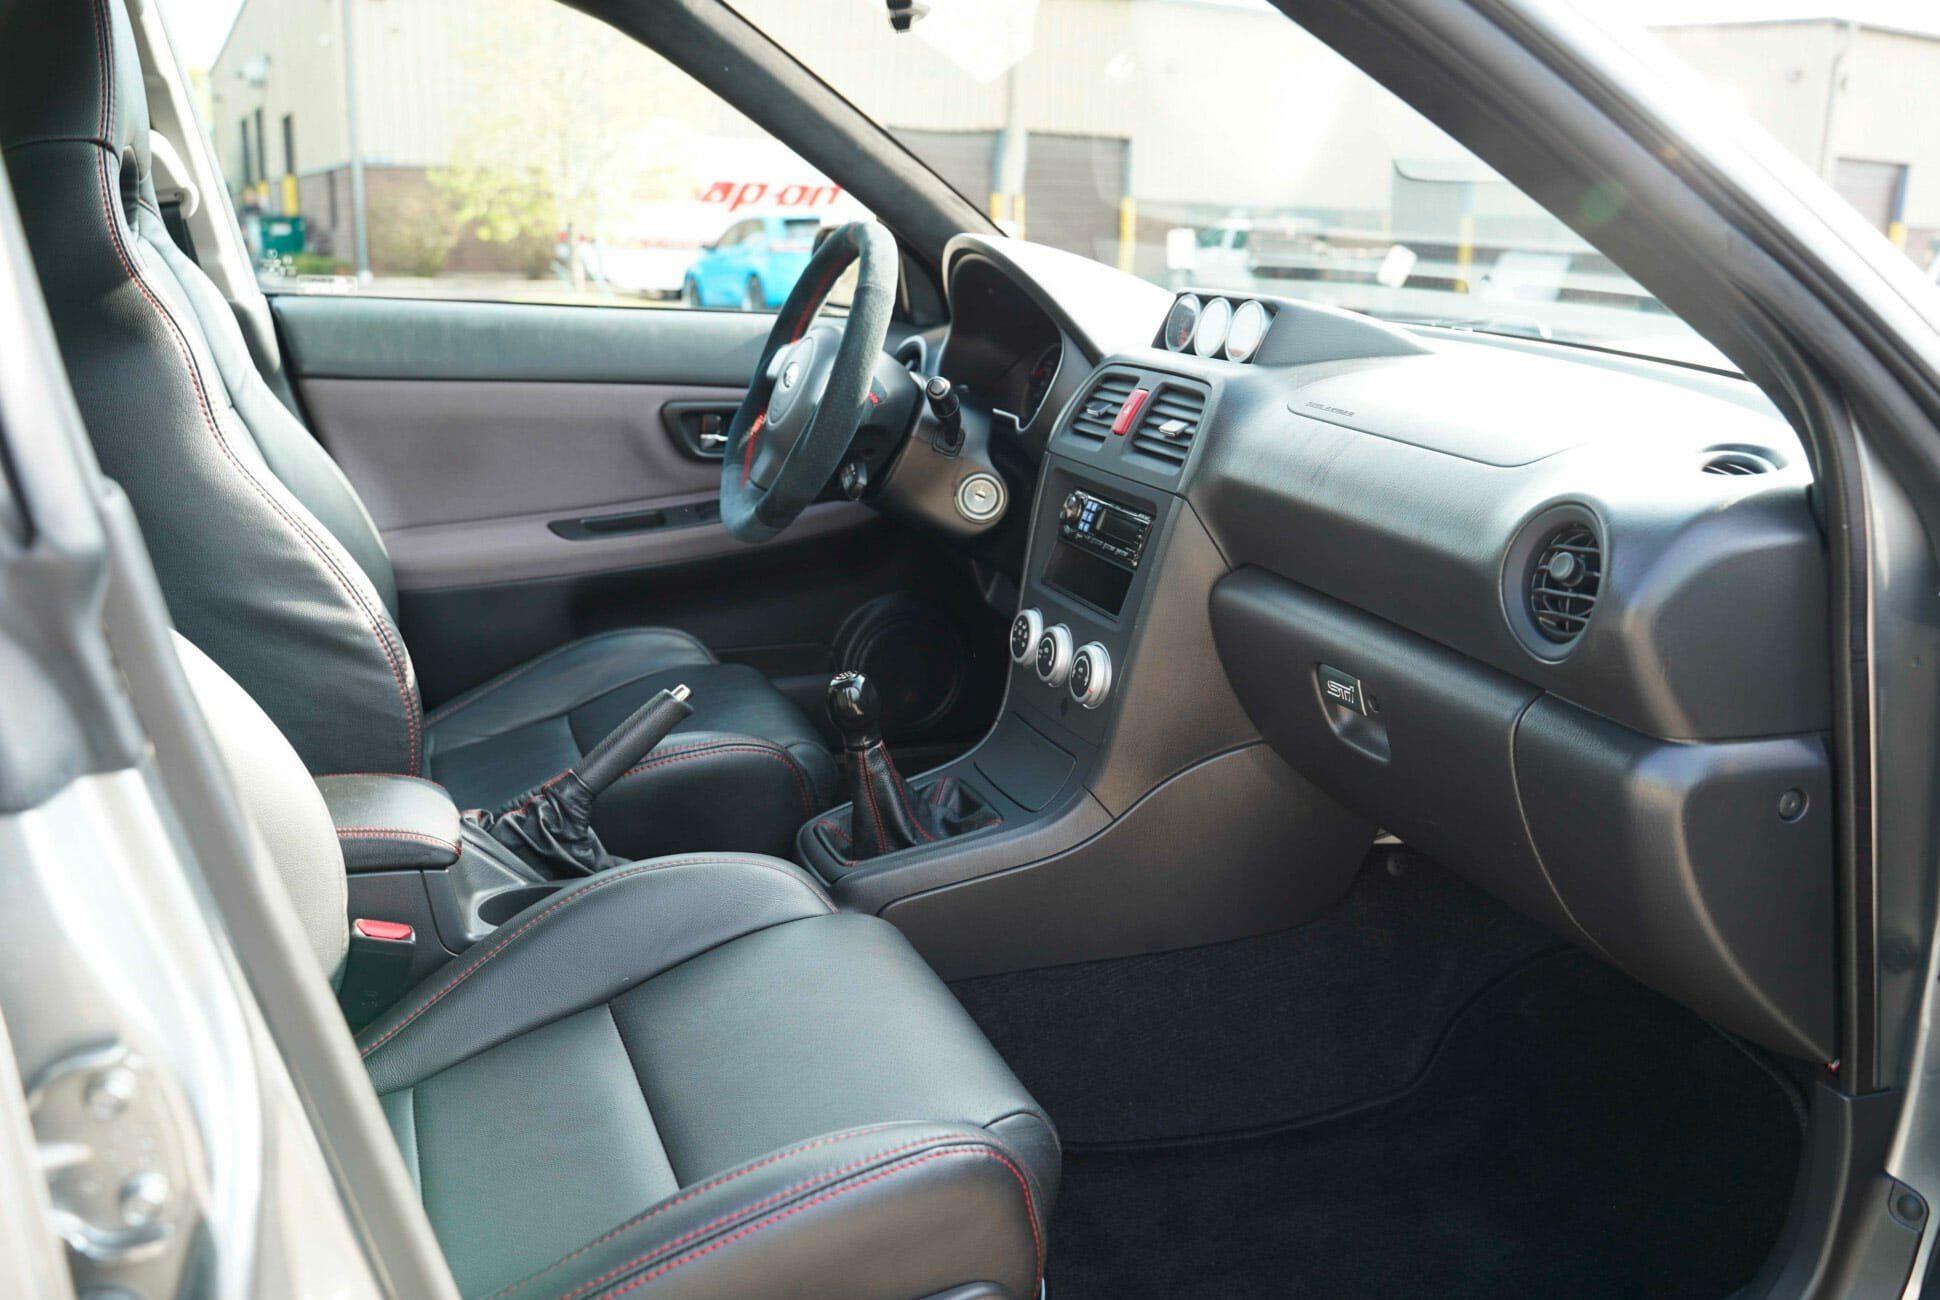 2007-Subaru-WRX-Wagon-14K-Miles-gear-patrol-slide-8